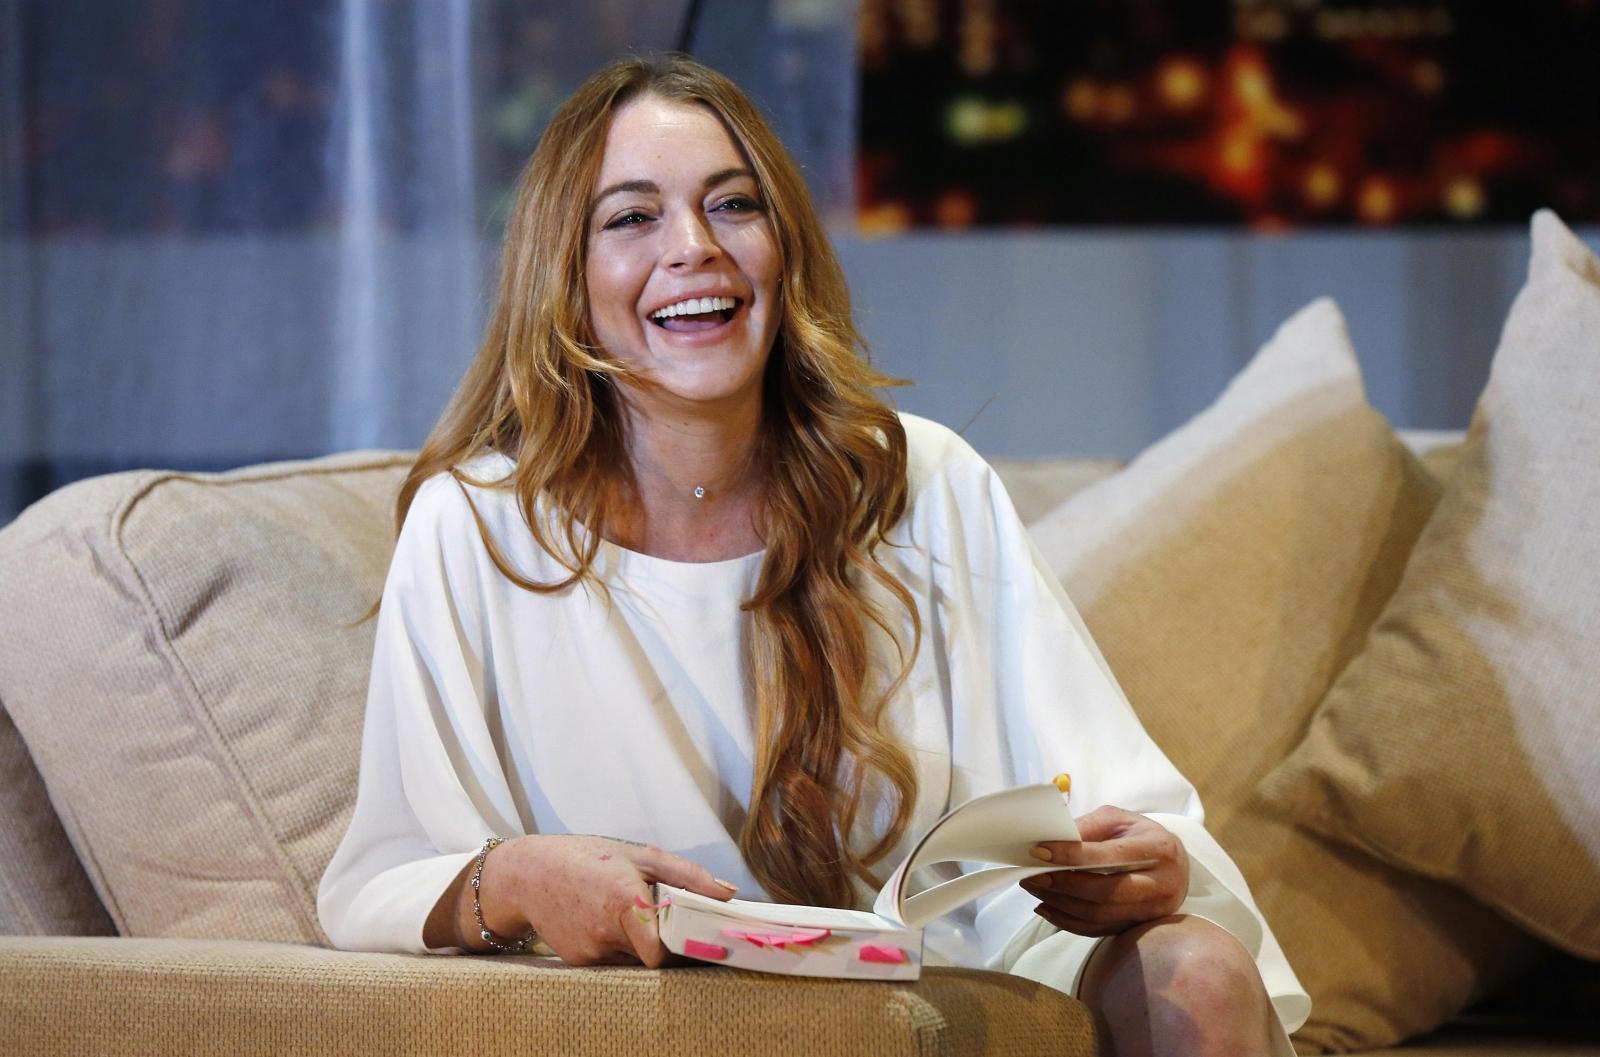 Lindsay Lohan sues Fox News for defamation